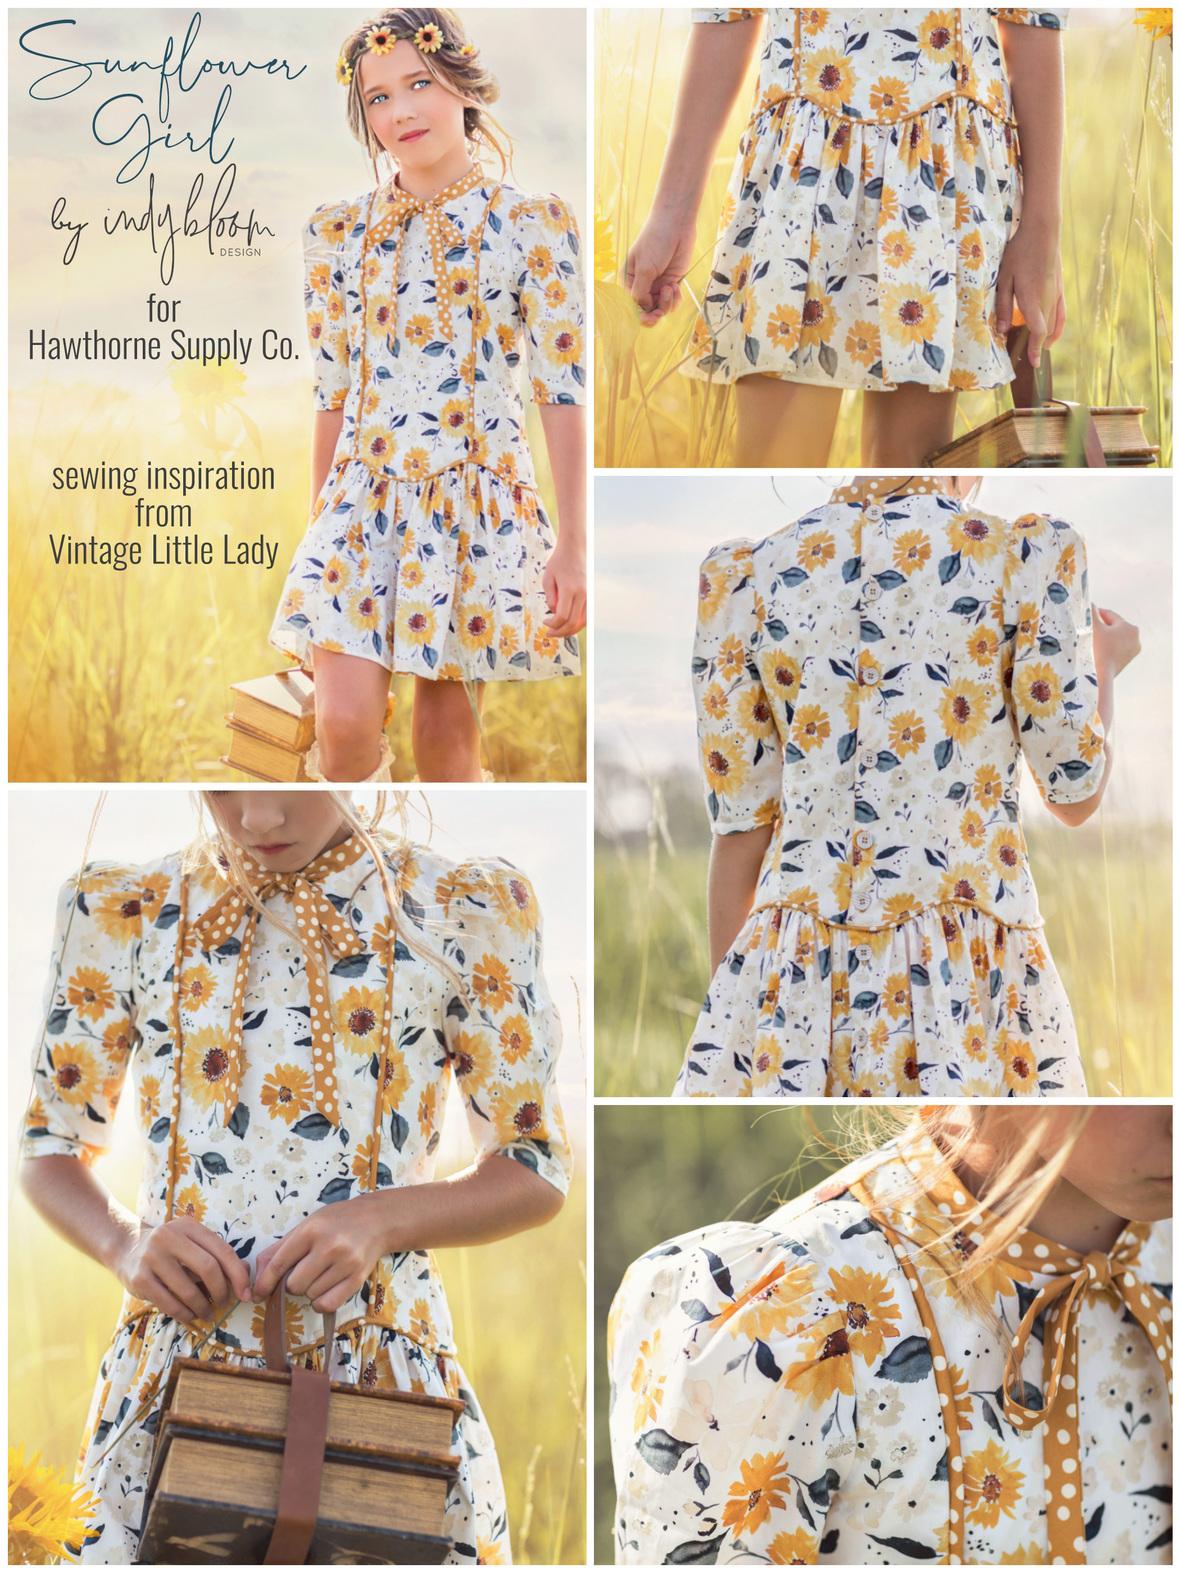 Vintage Little Lady Indybloom Sunflower Girl Dress Hawthorne Supply Co.